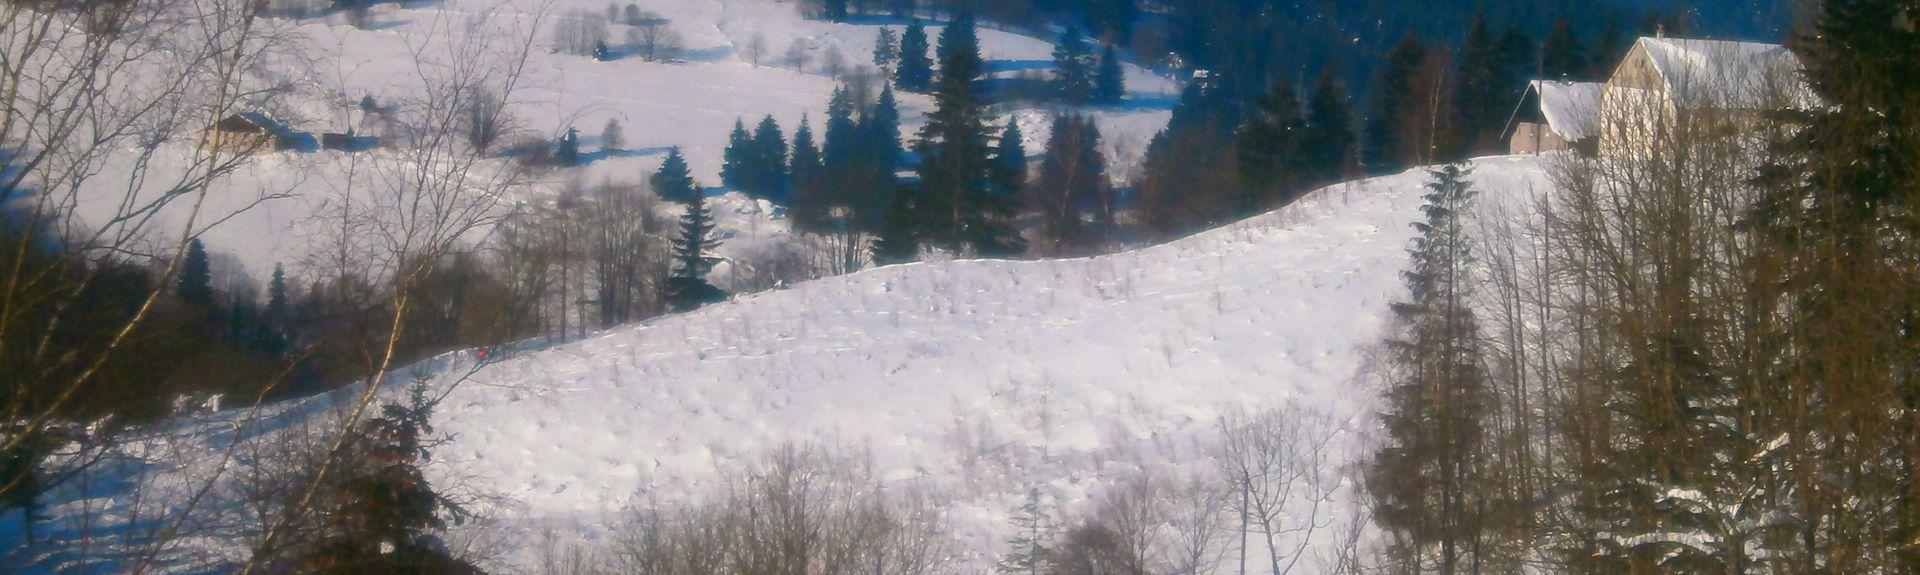 Soultz-Haut-Rhin, Haut-Rhin (department), France